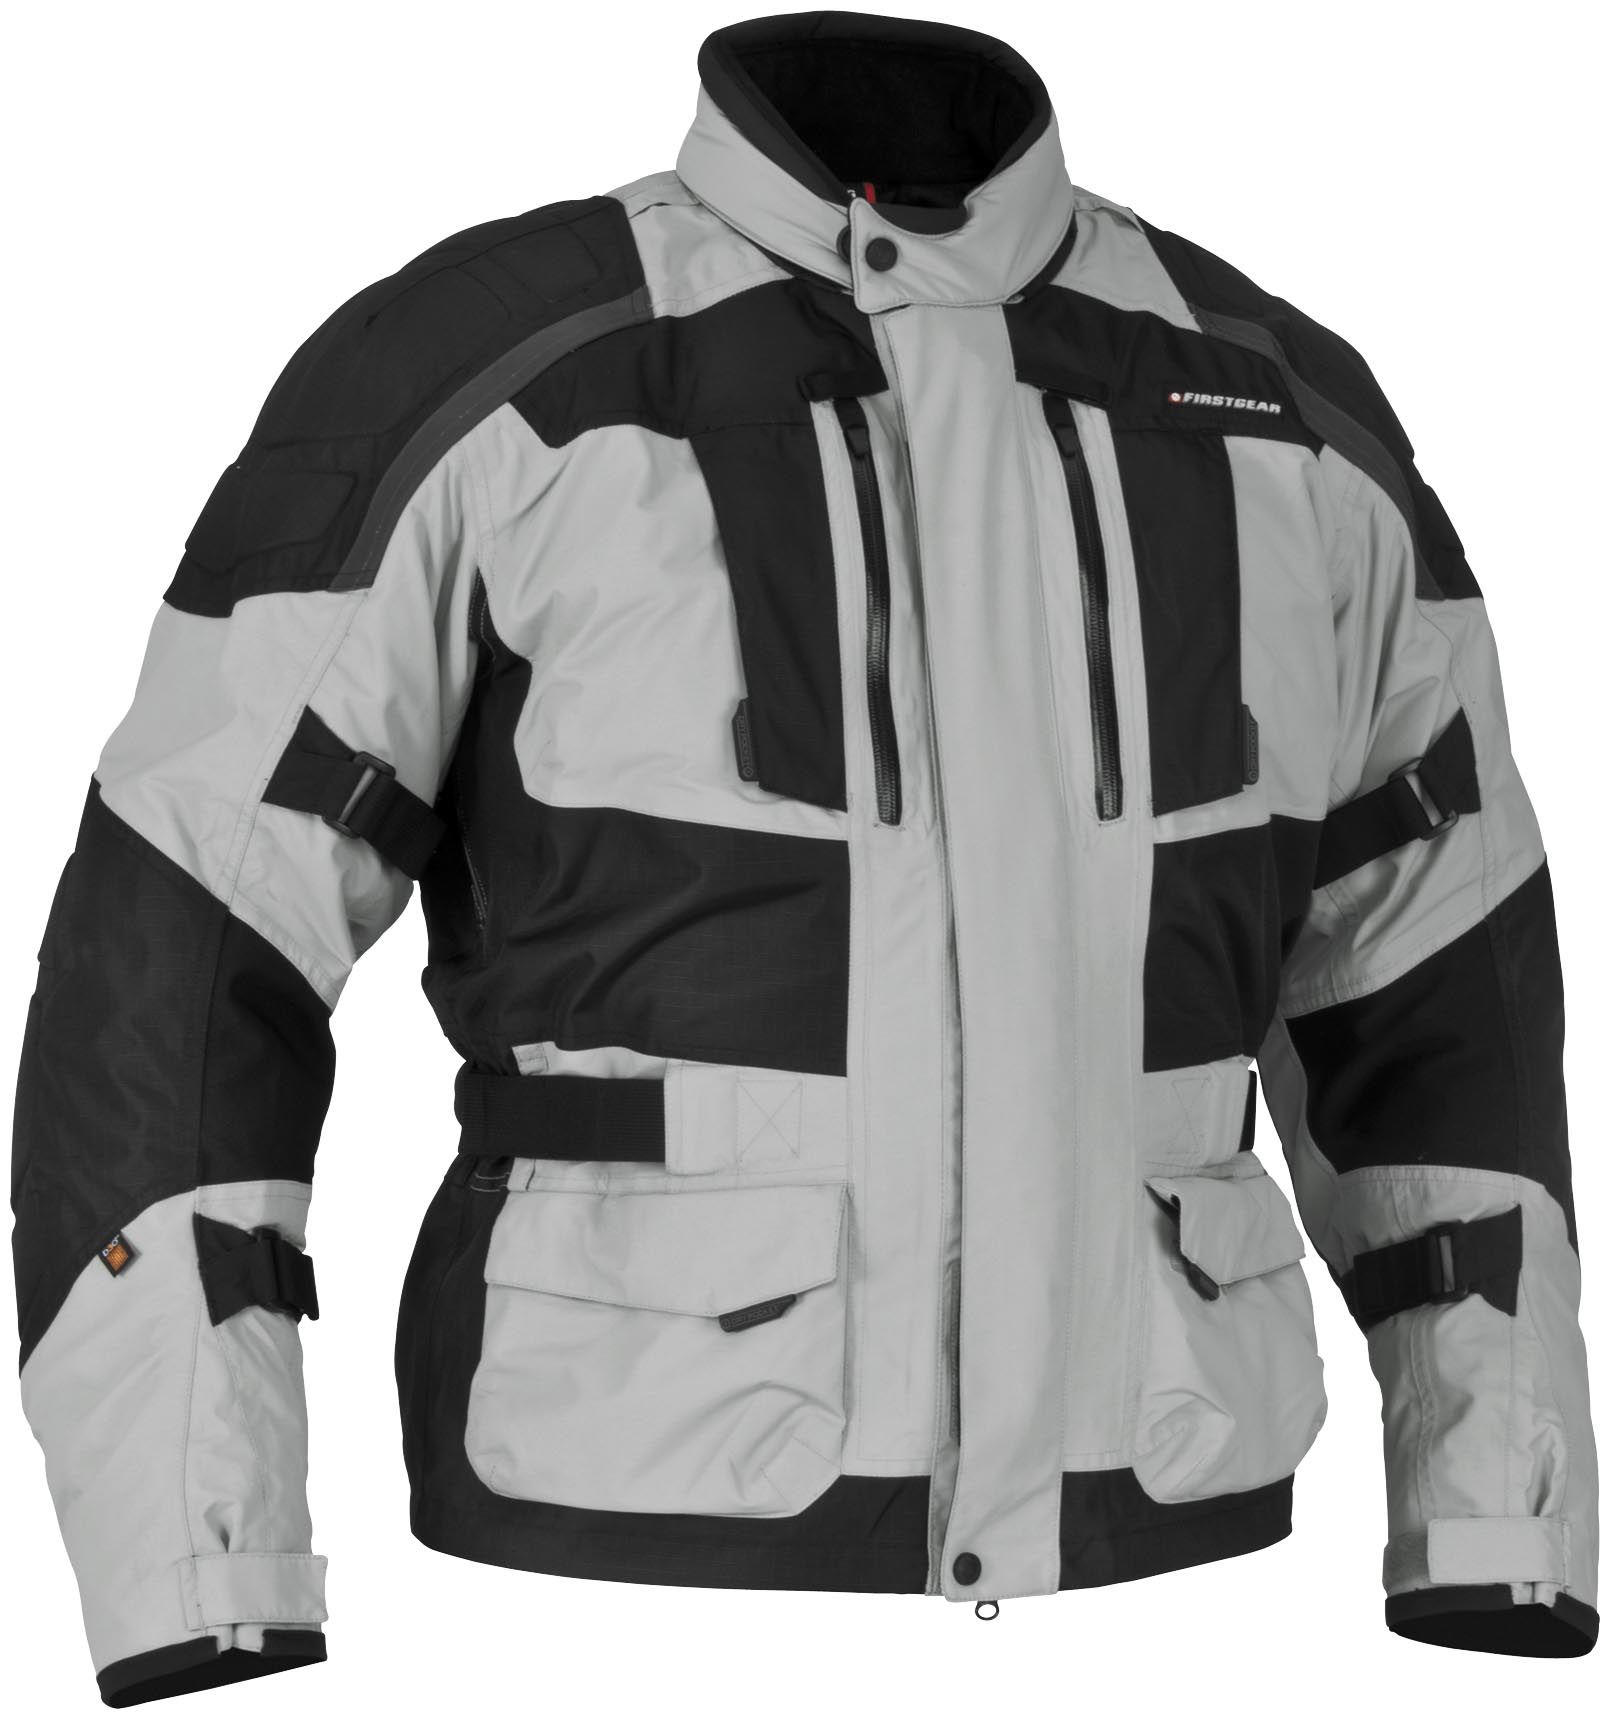 Firstgear Kathmandu Jacket (With images) Jackets